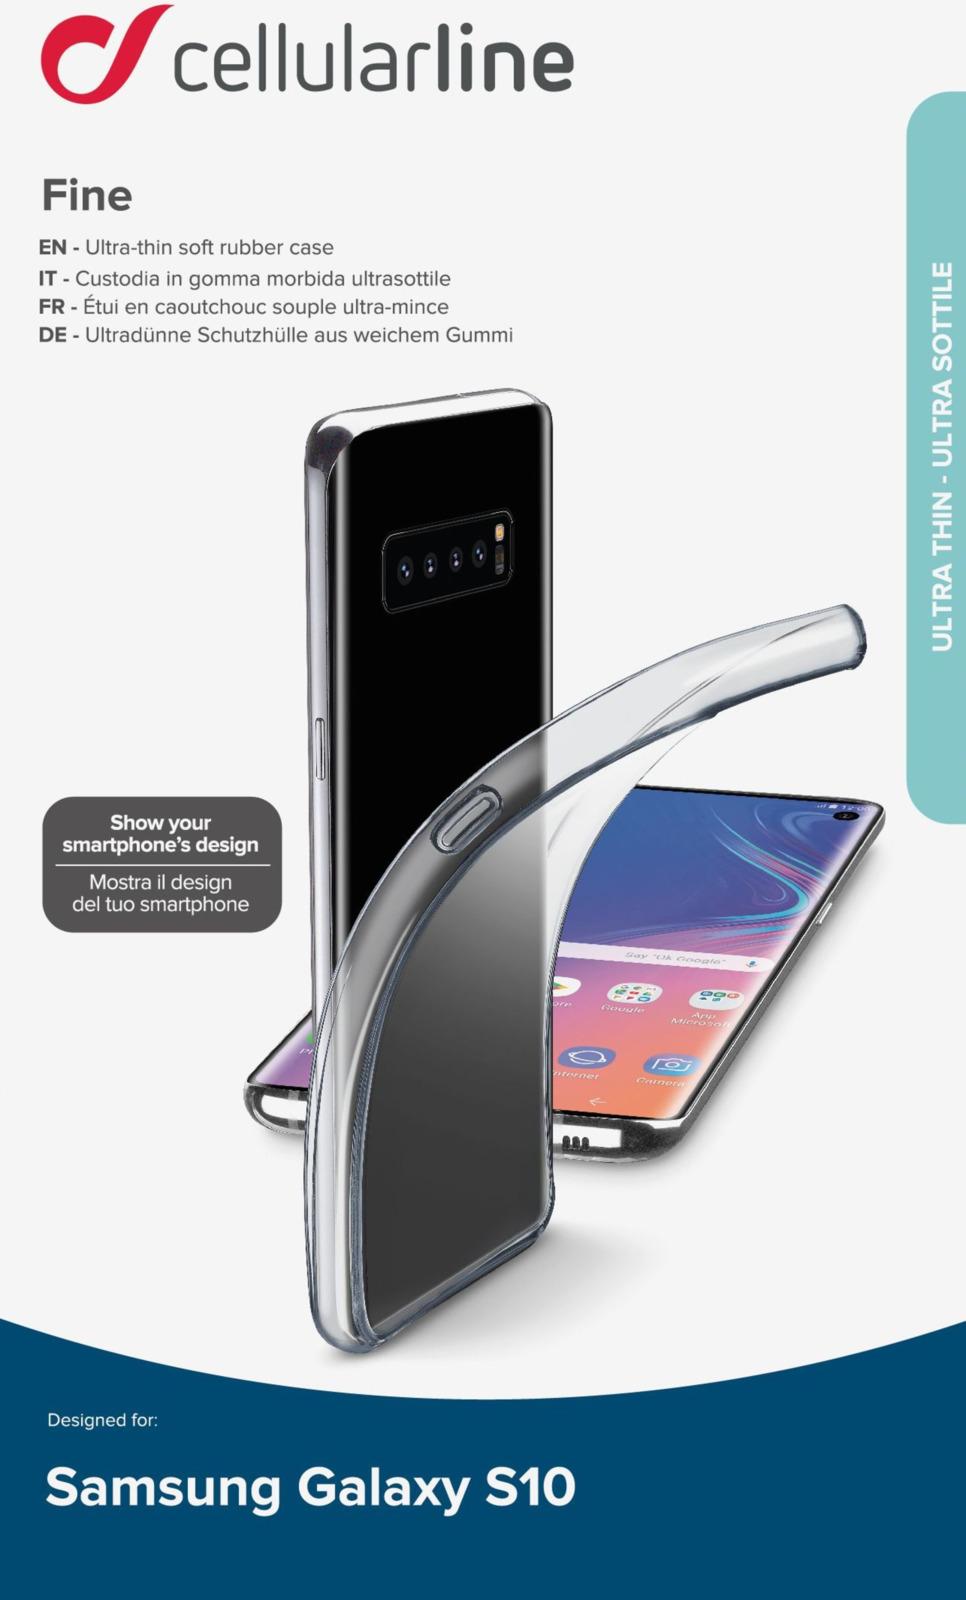 Чехол Cellularline для Samsung Galaxy S10, FINECGALS10T, прозрачный чехол для samsung galaxy s8 cellularline clear duo прозрачный